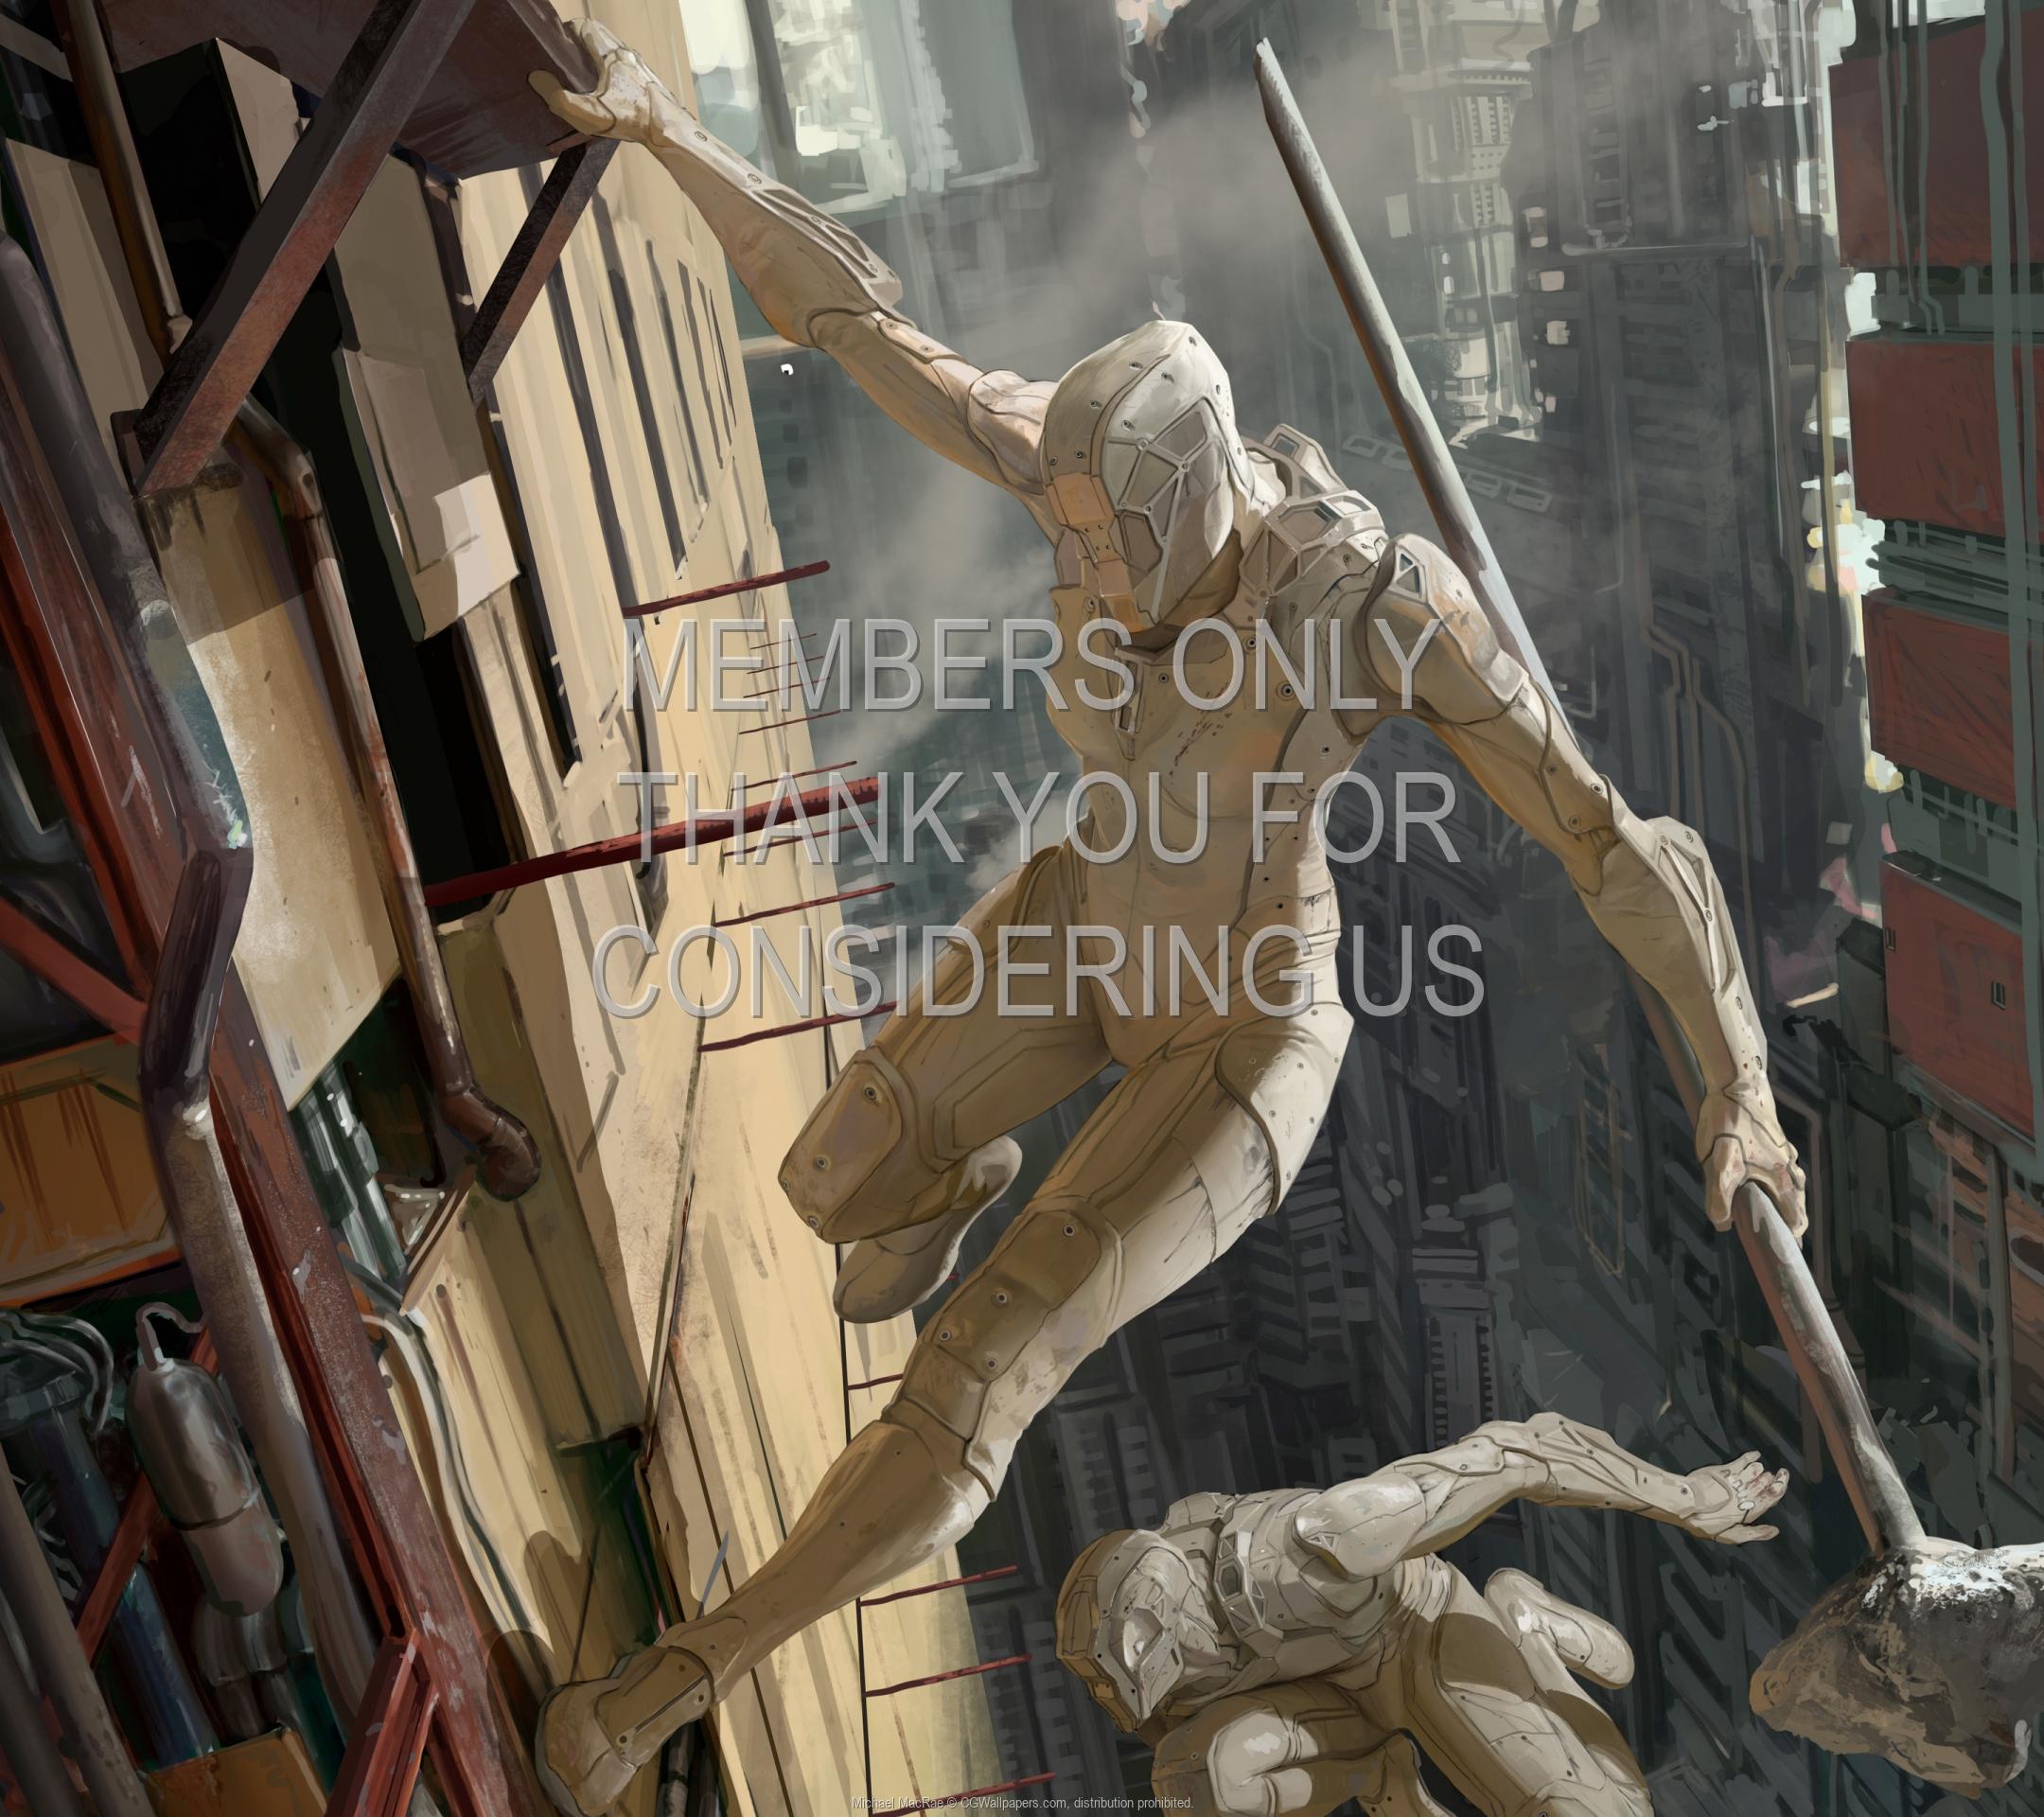 Michael MacRae 1080p Horizontal Mobile wallpaper or background 02